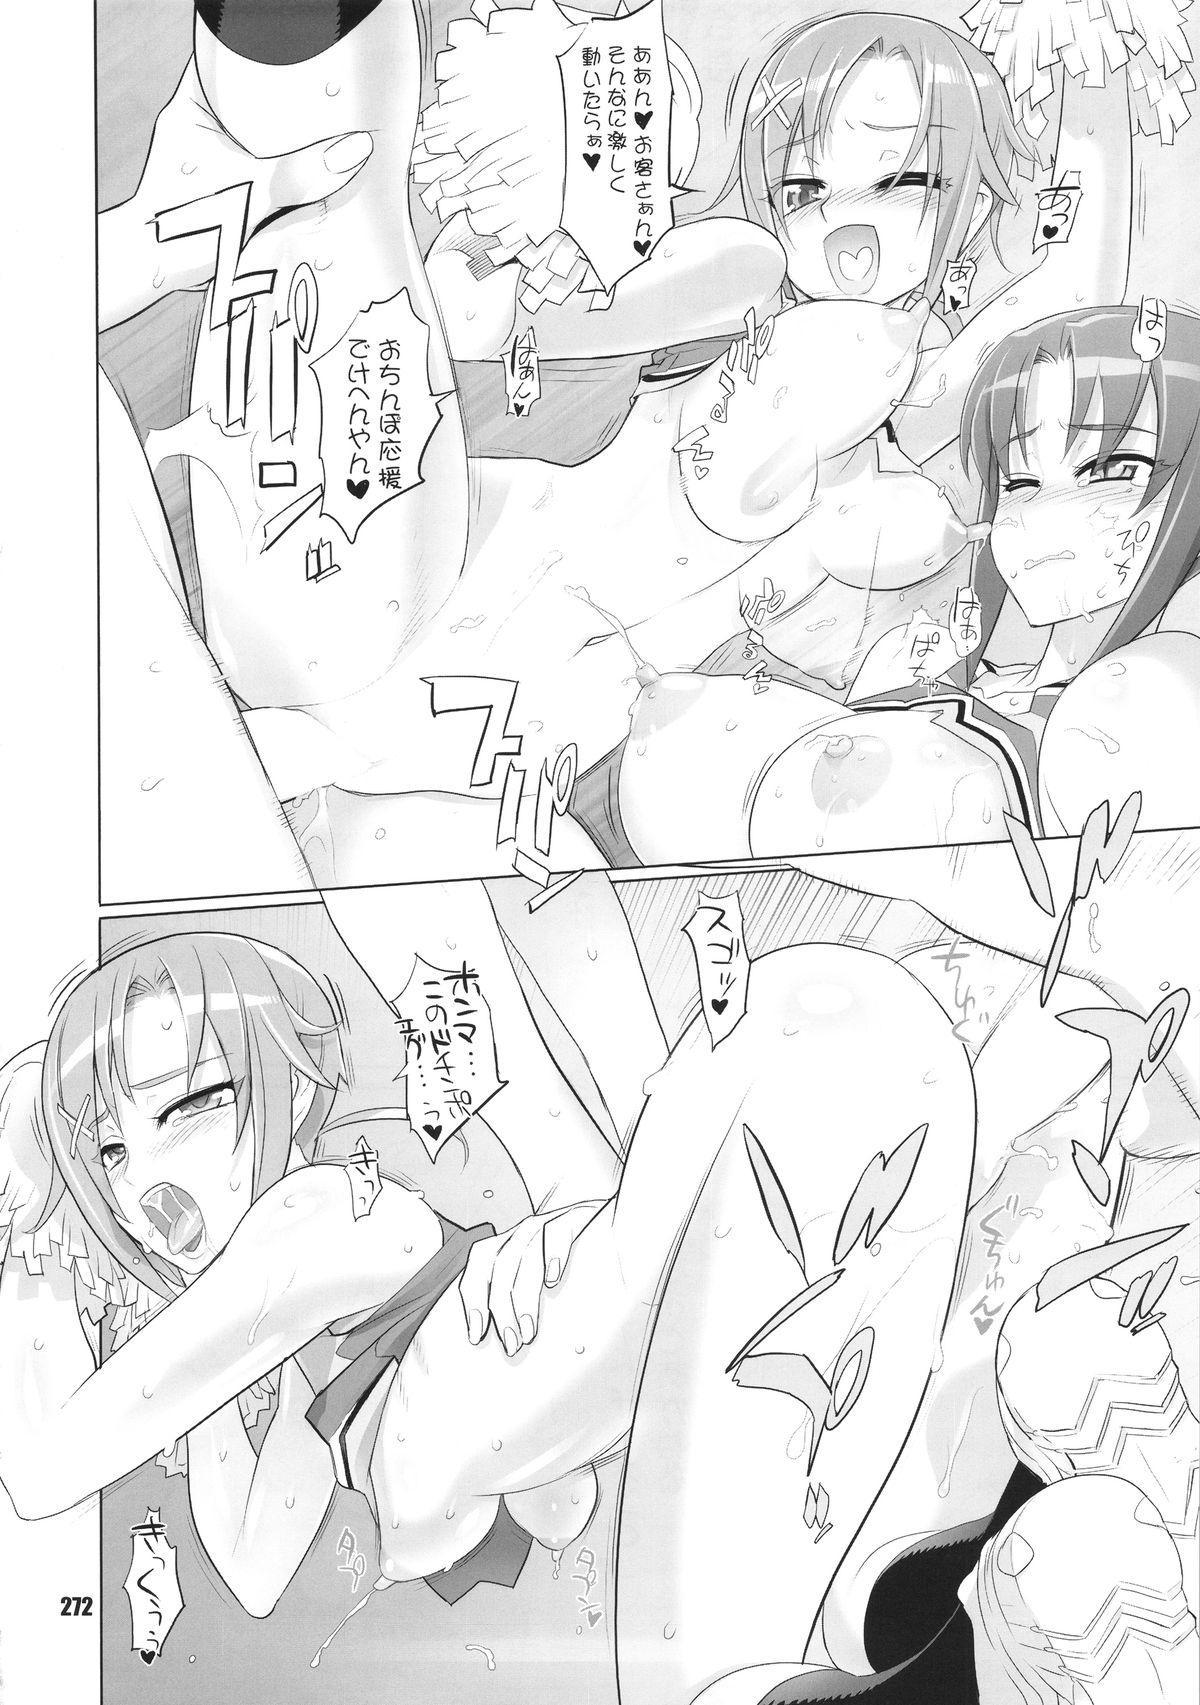 Inazuma Pretty Warrior 270